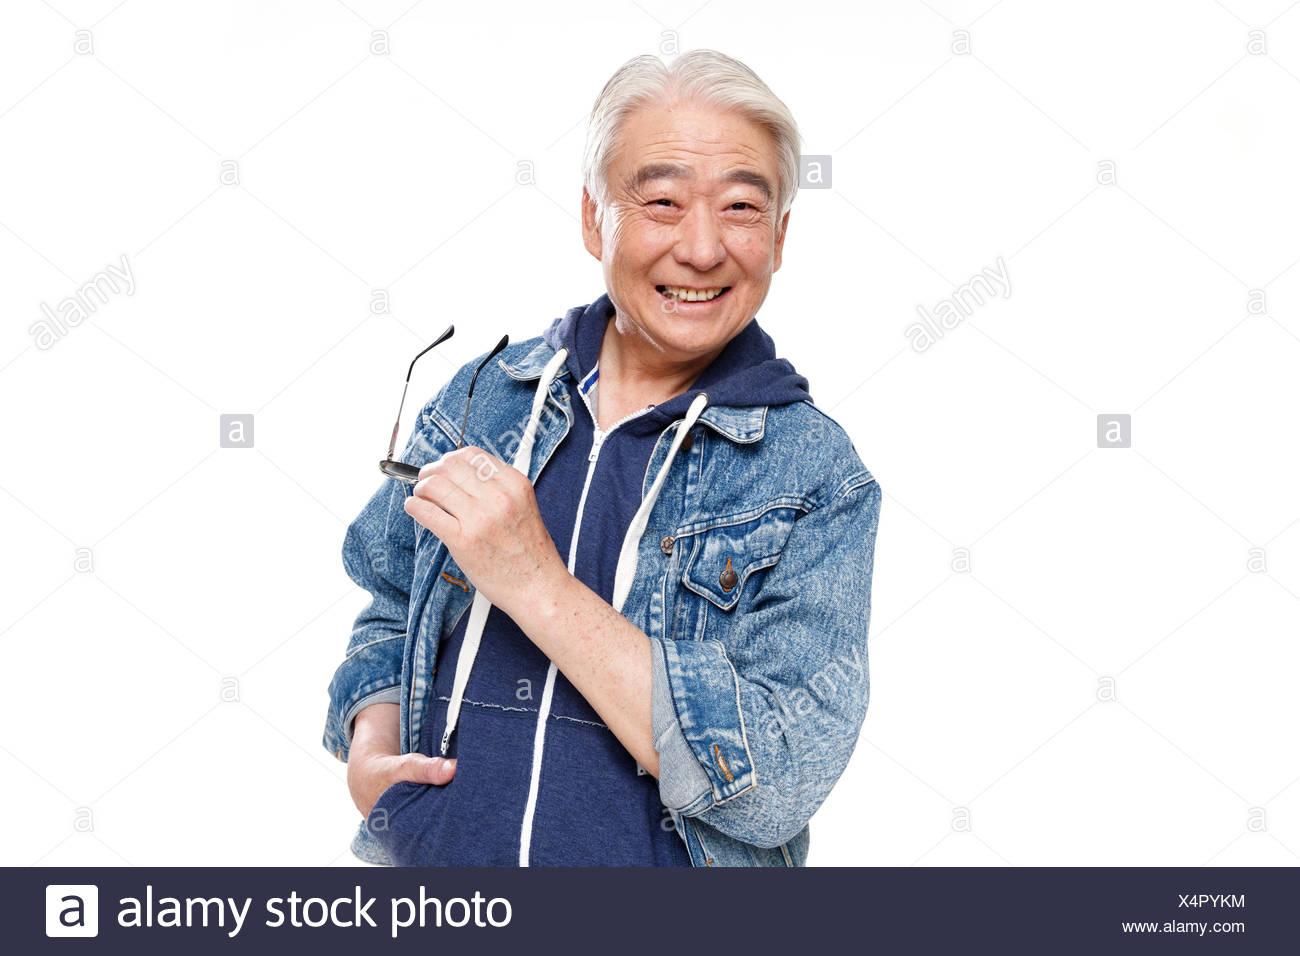 Fashionable older men - Stock Image